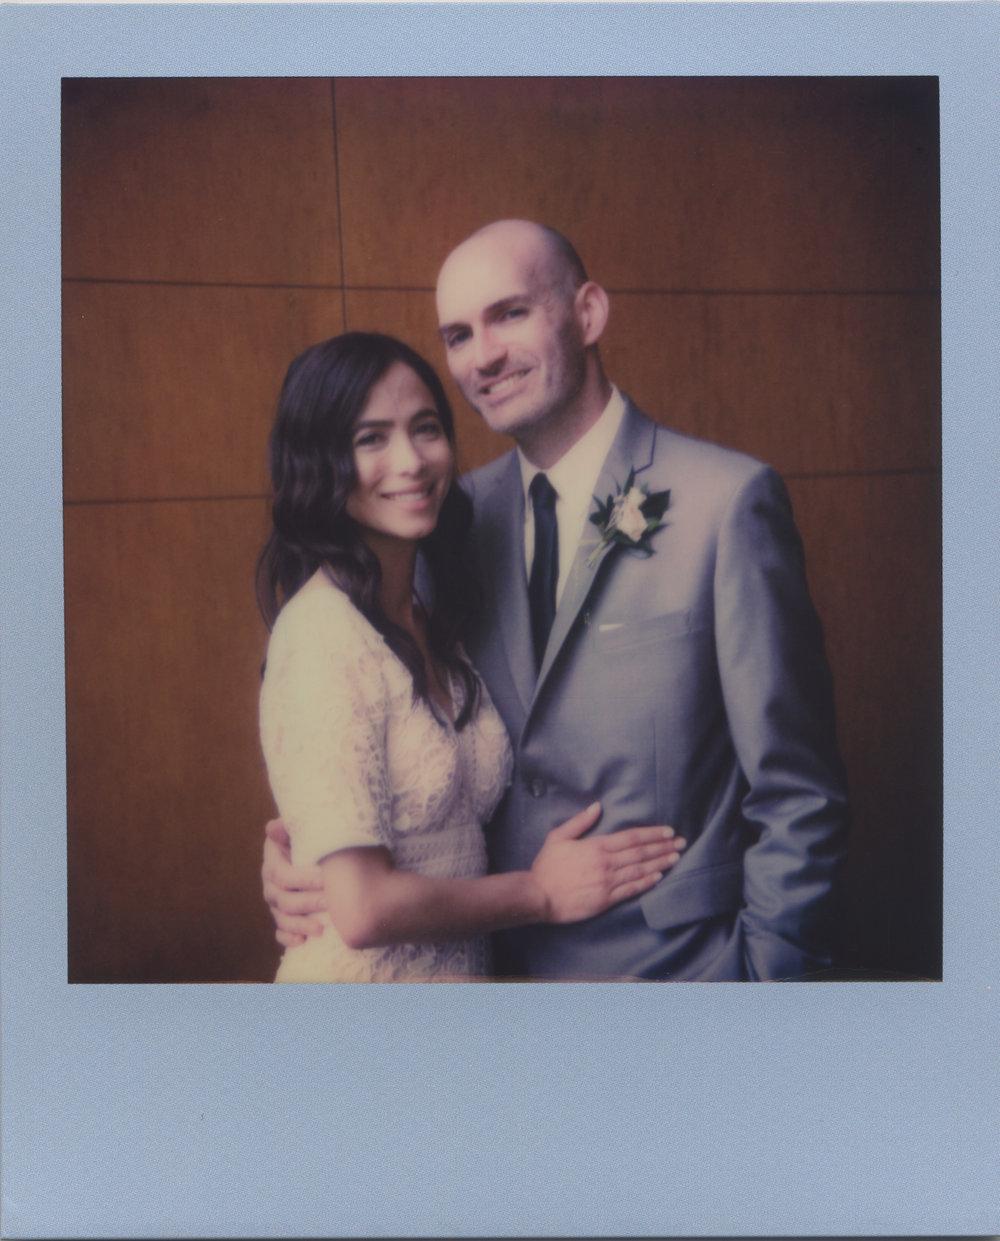 polaroidoriginal_nikitagross_wedding (2).jpeg